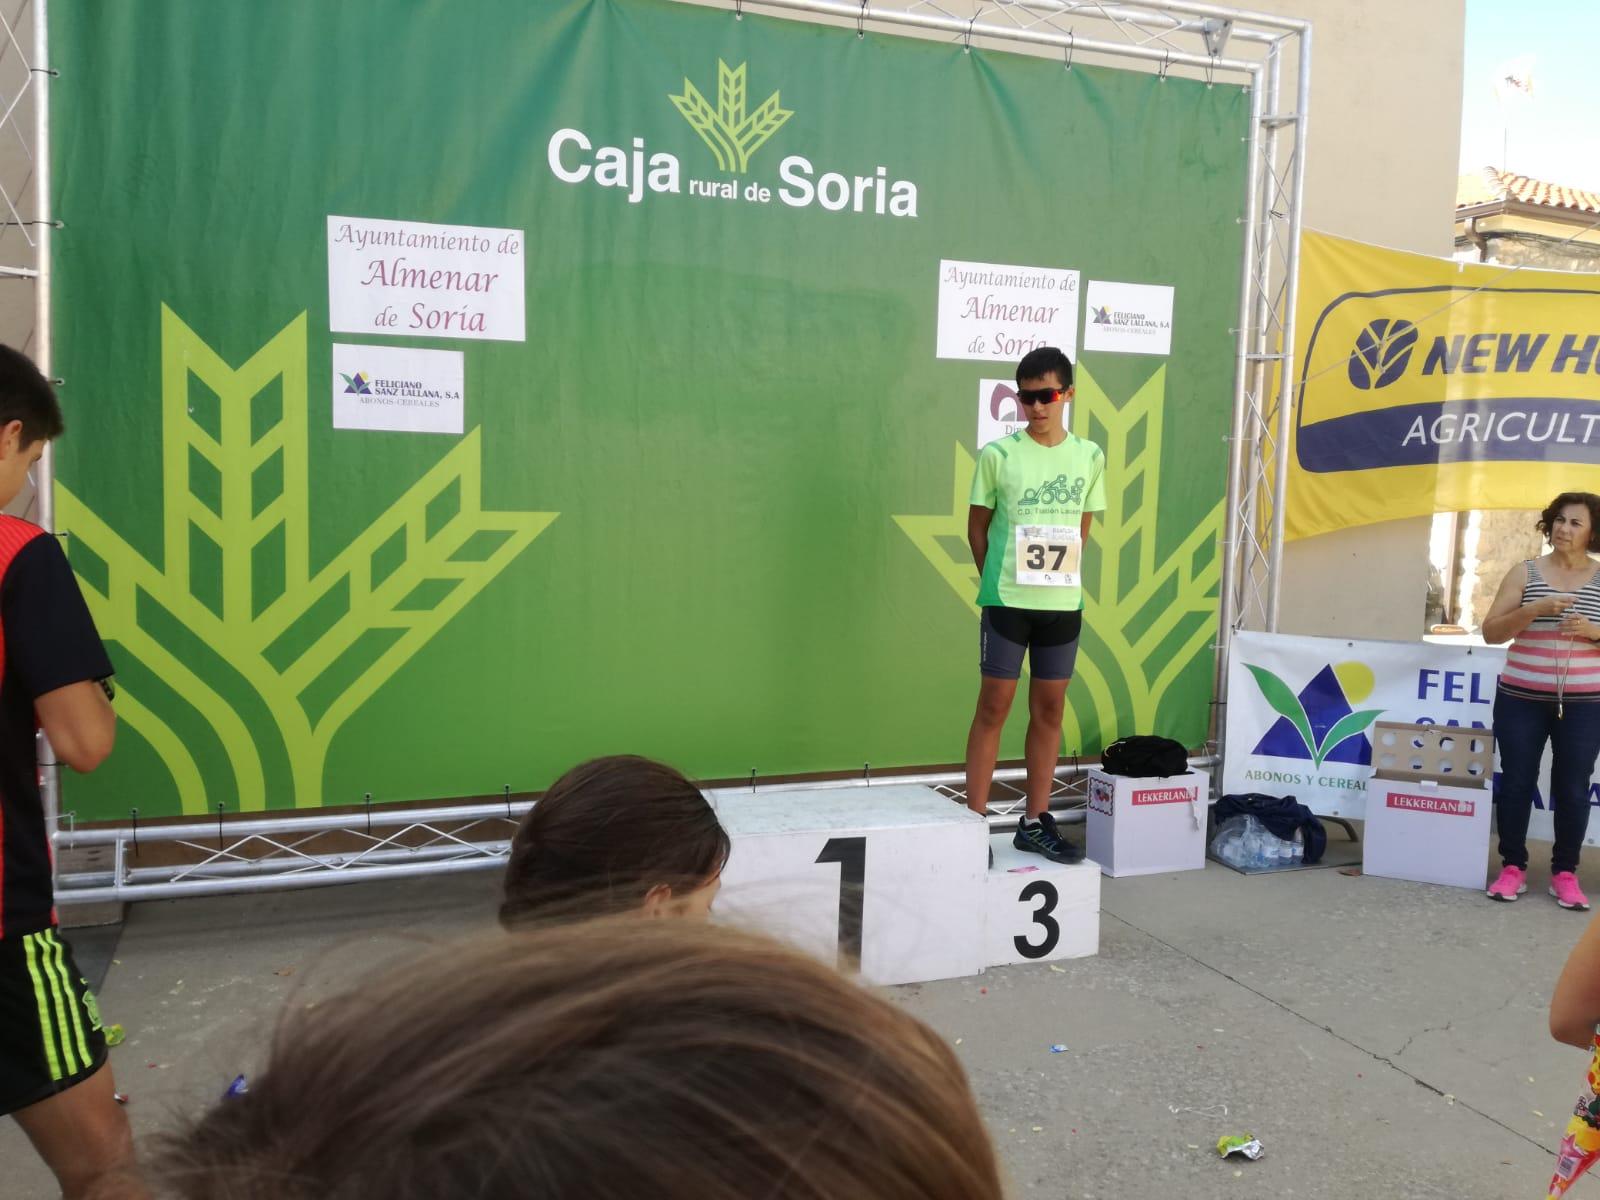 Club Triatlón Lacerta: Crónica del Fin de Semana